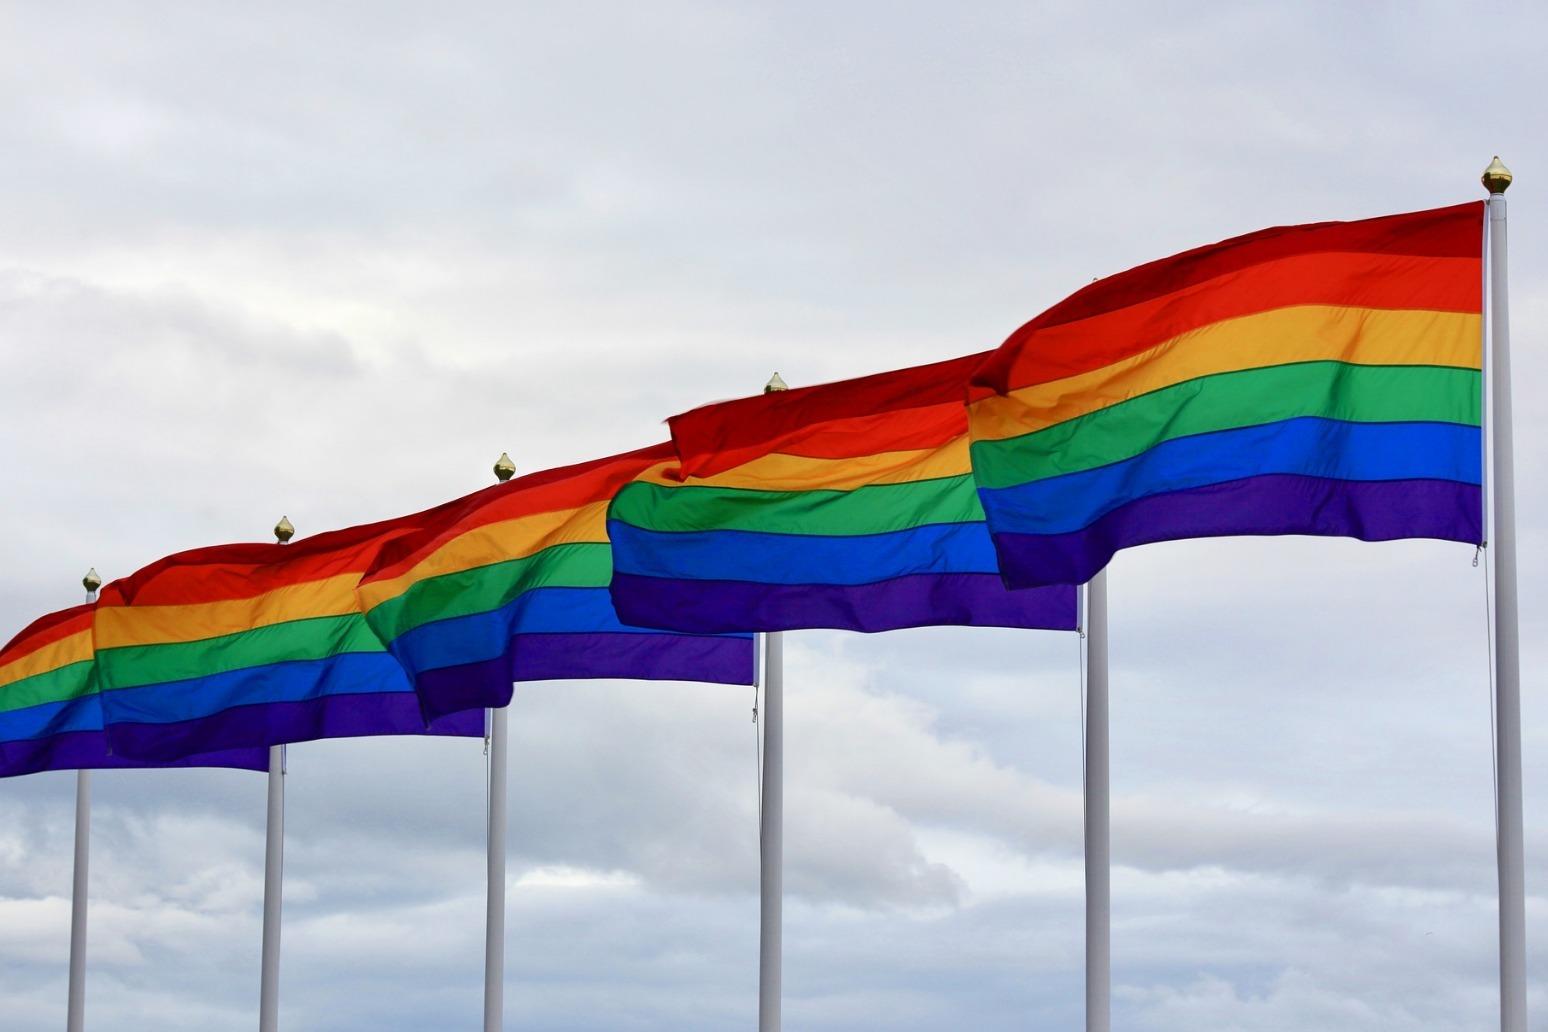 UK should not detain \'at risk\' LGBT+ asylum seekers